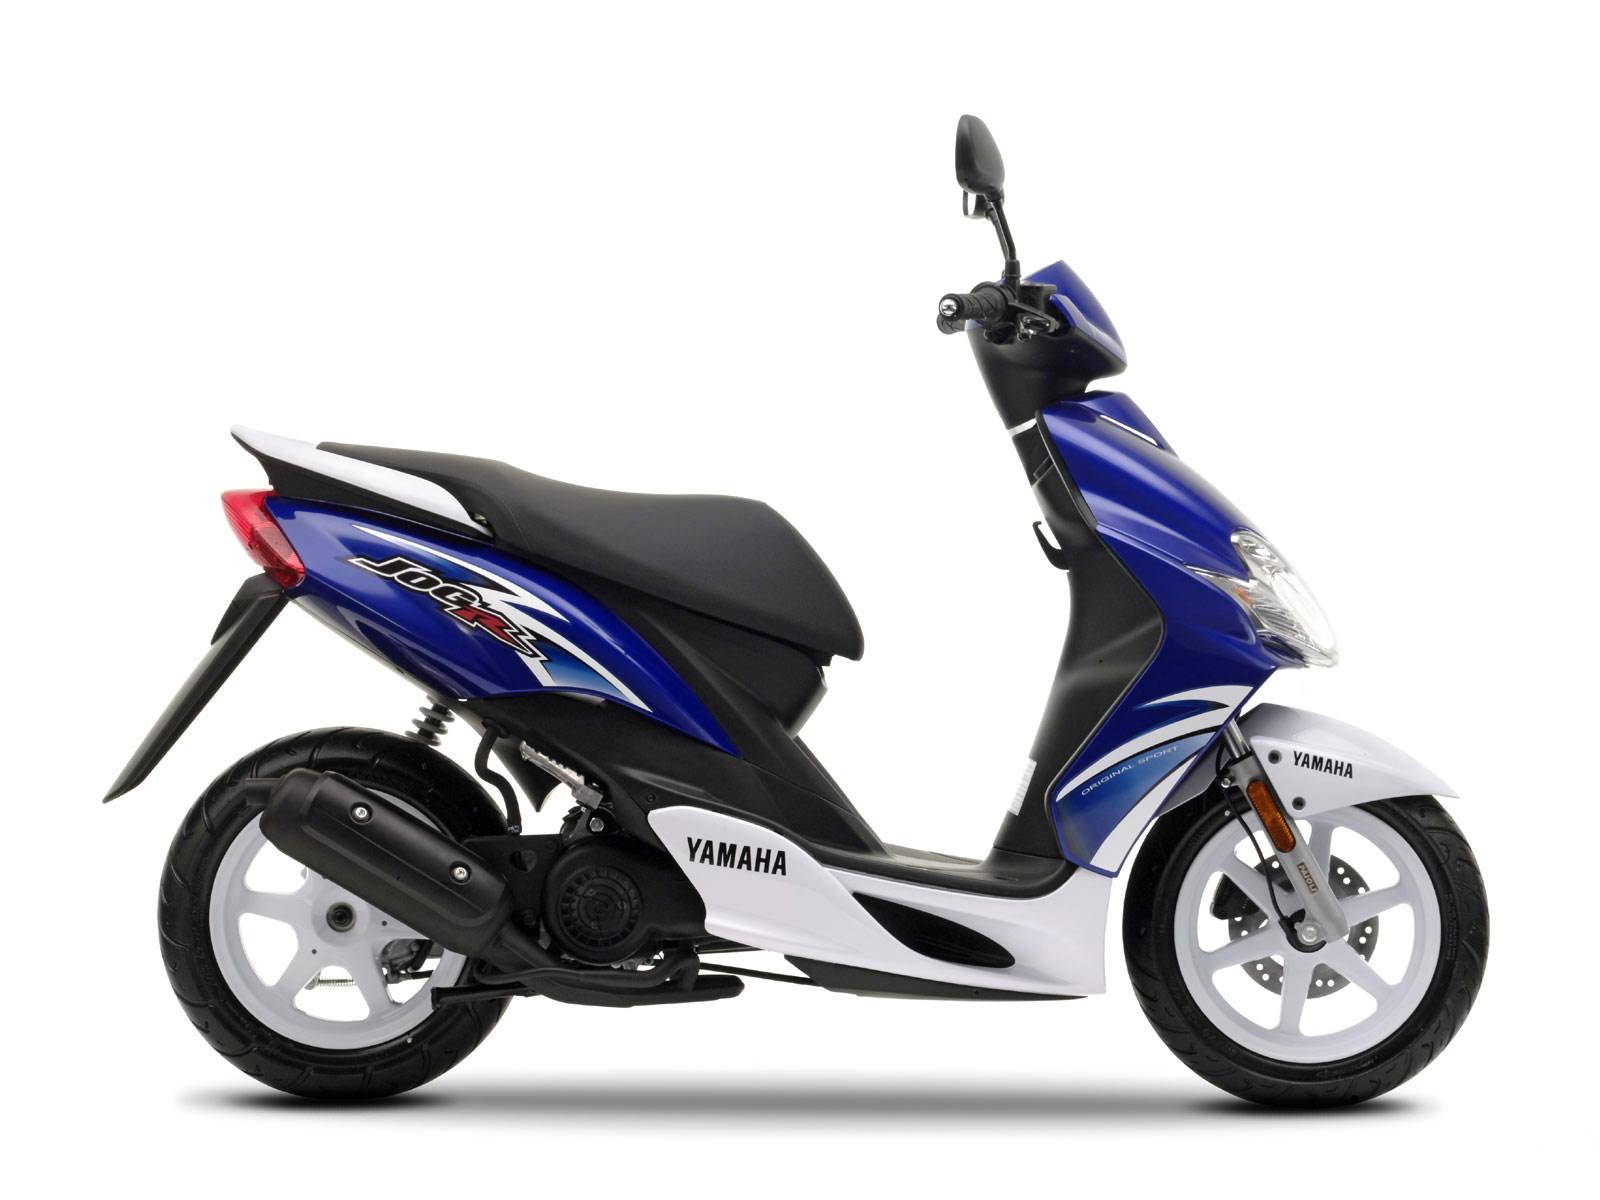 Yamaha Atv Specifications